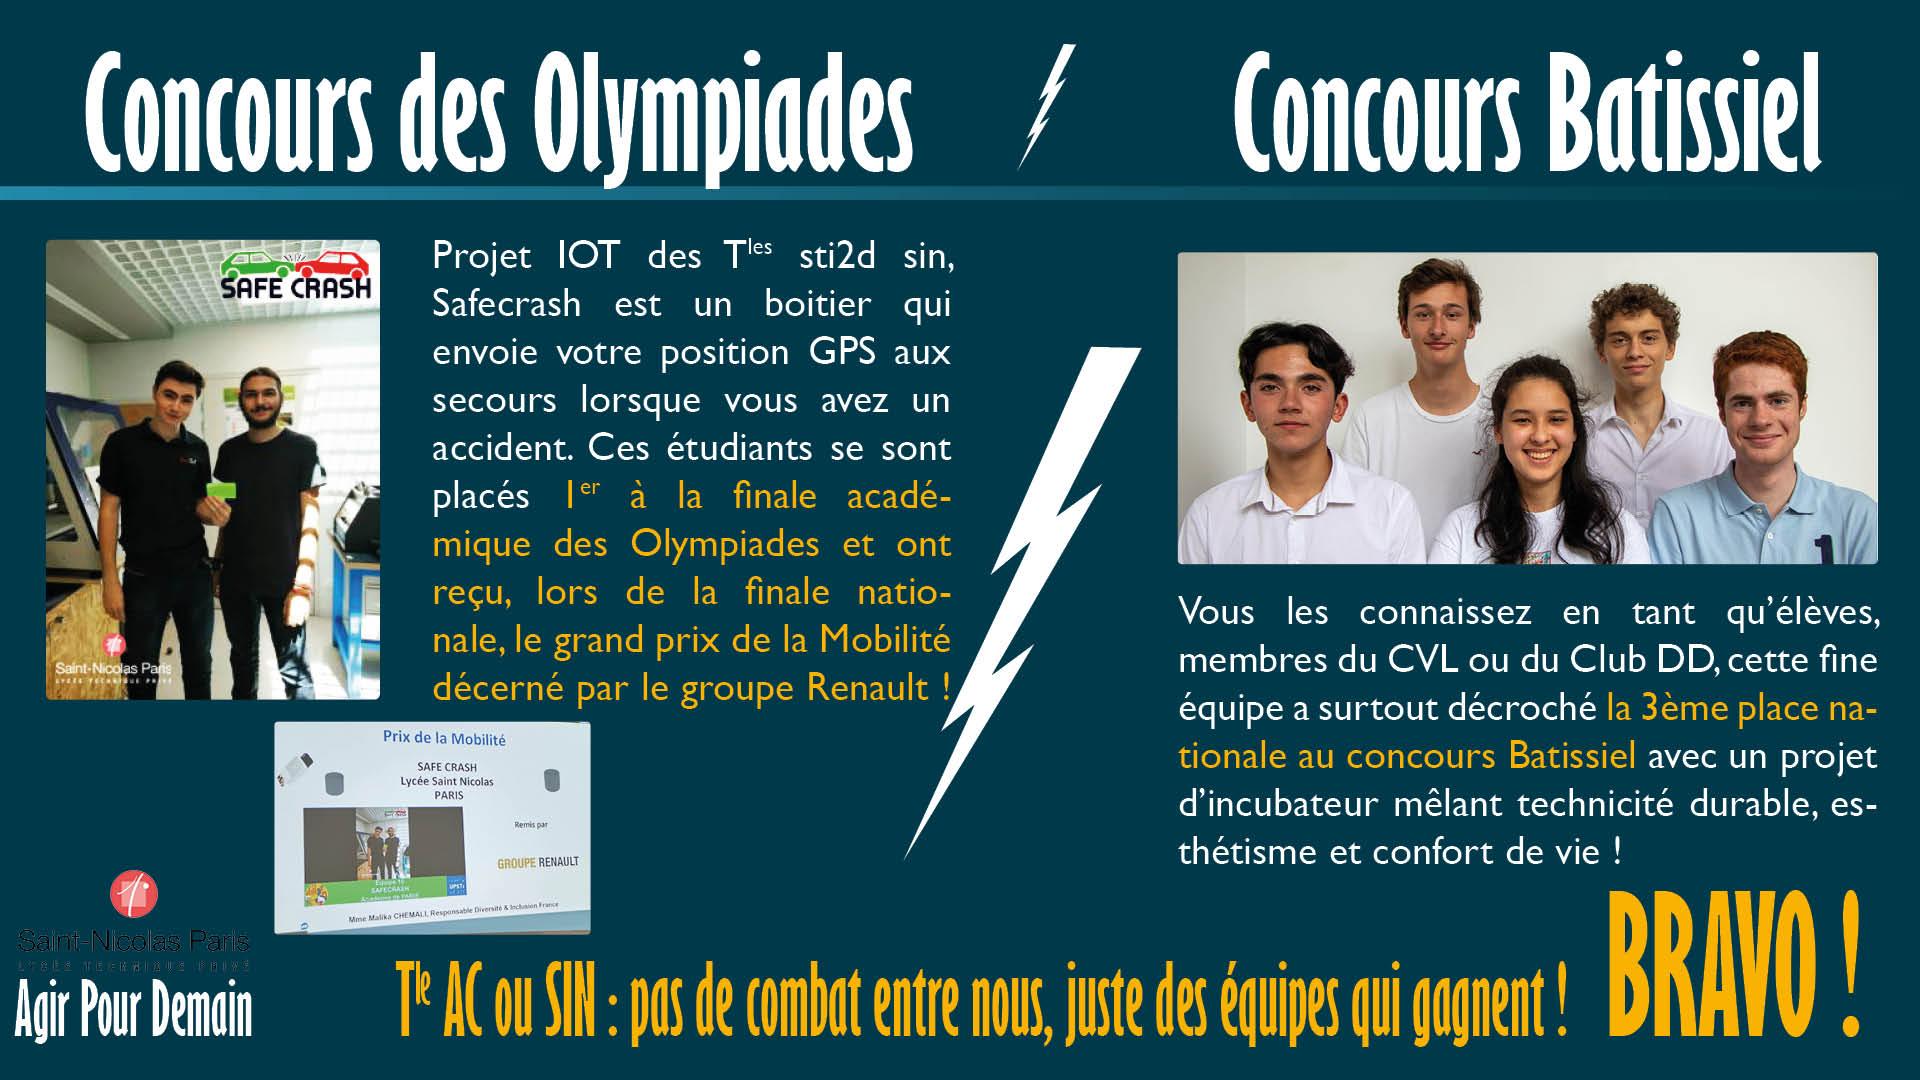 Concours des Olympiades / Concours Batissiel